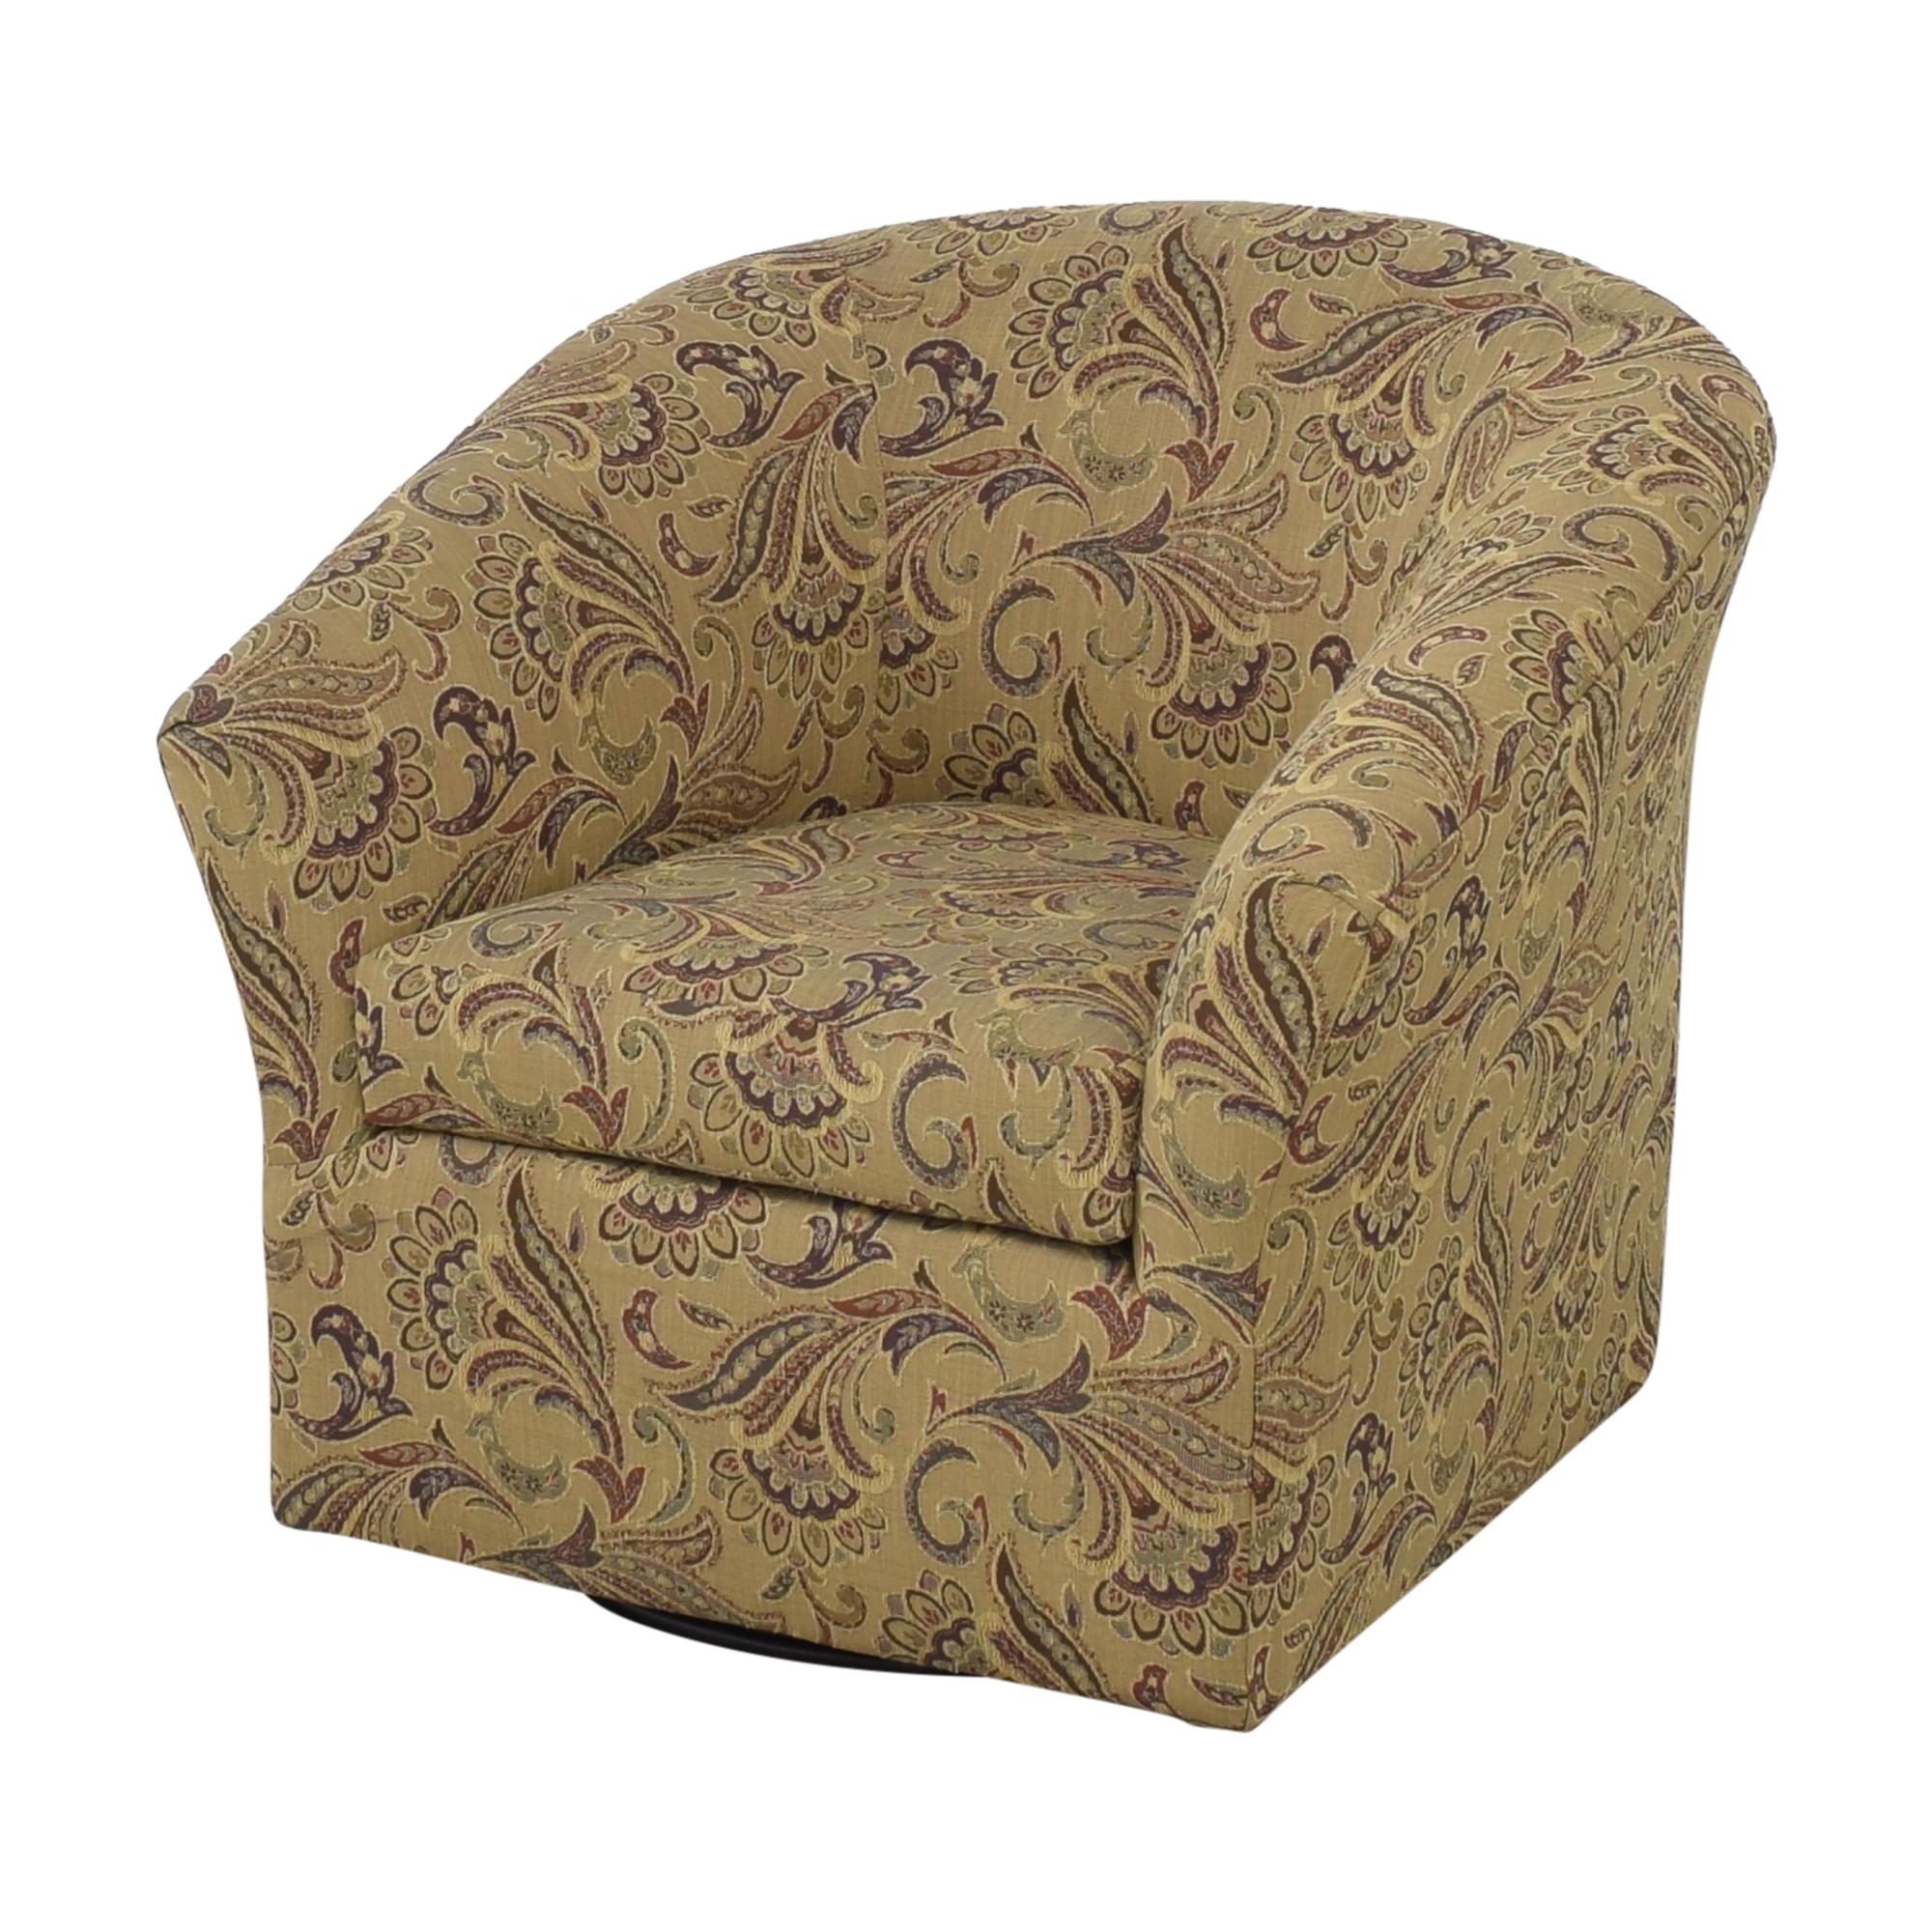 Hooker Furniture Hooker Furniture Sam Moore Swivel Accent Chair pa